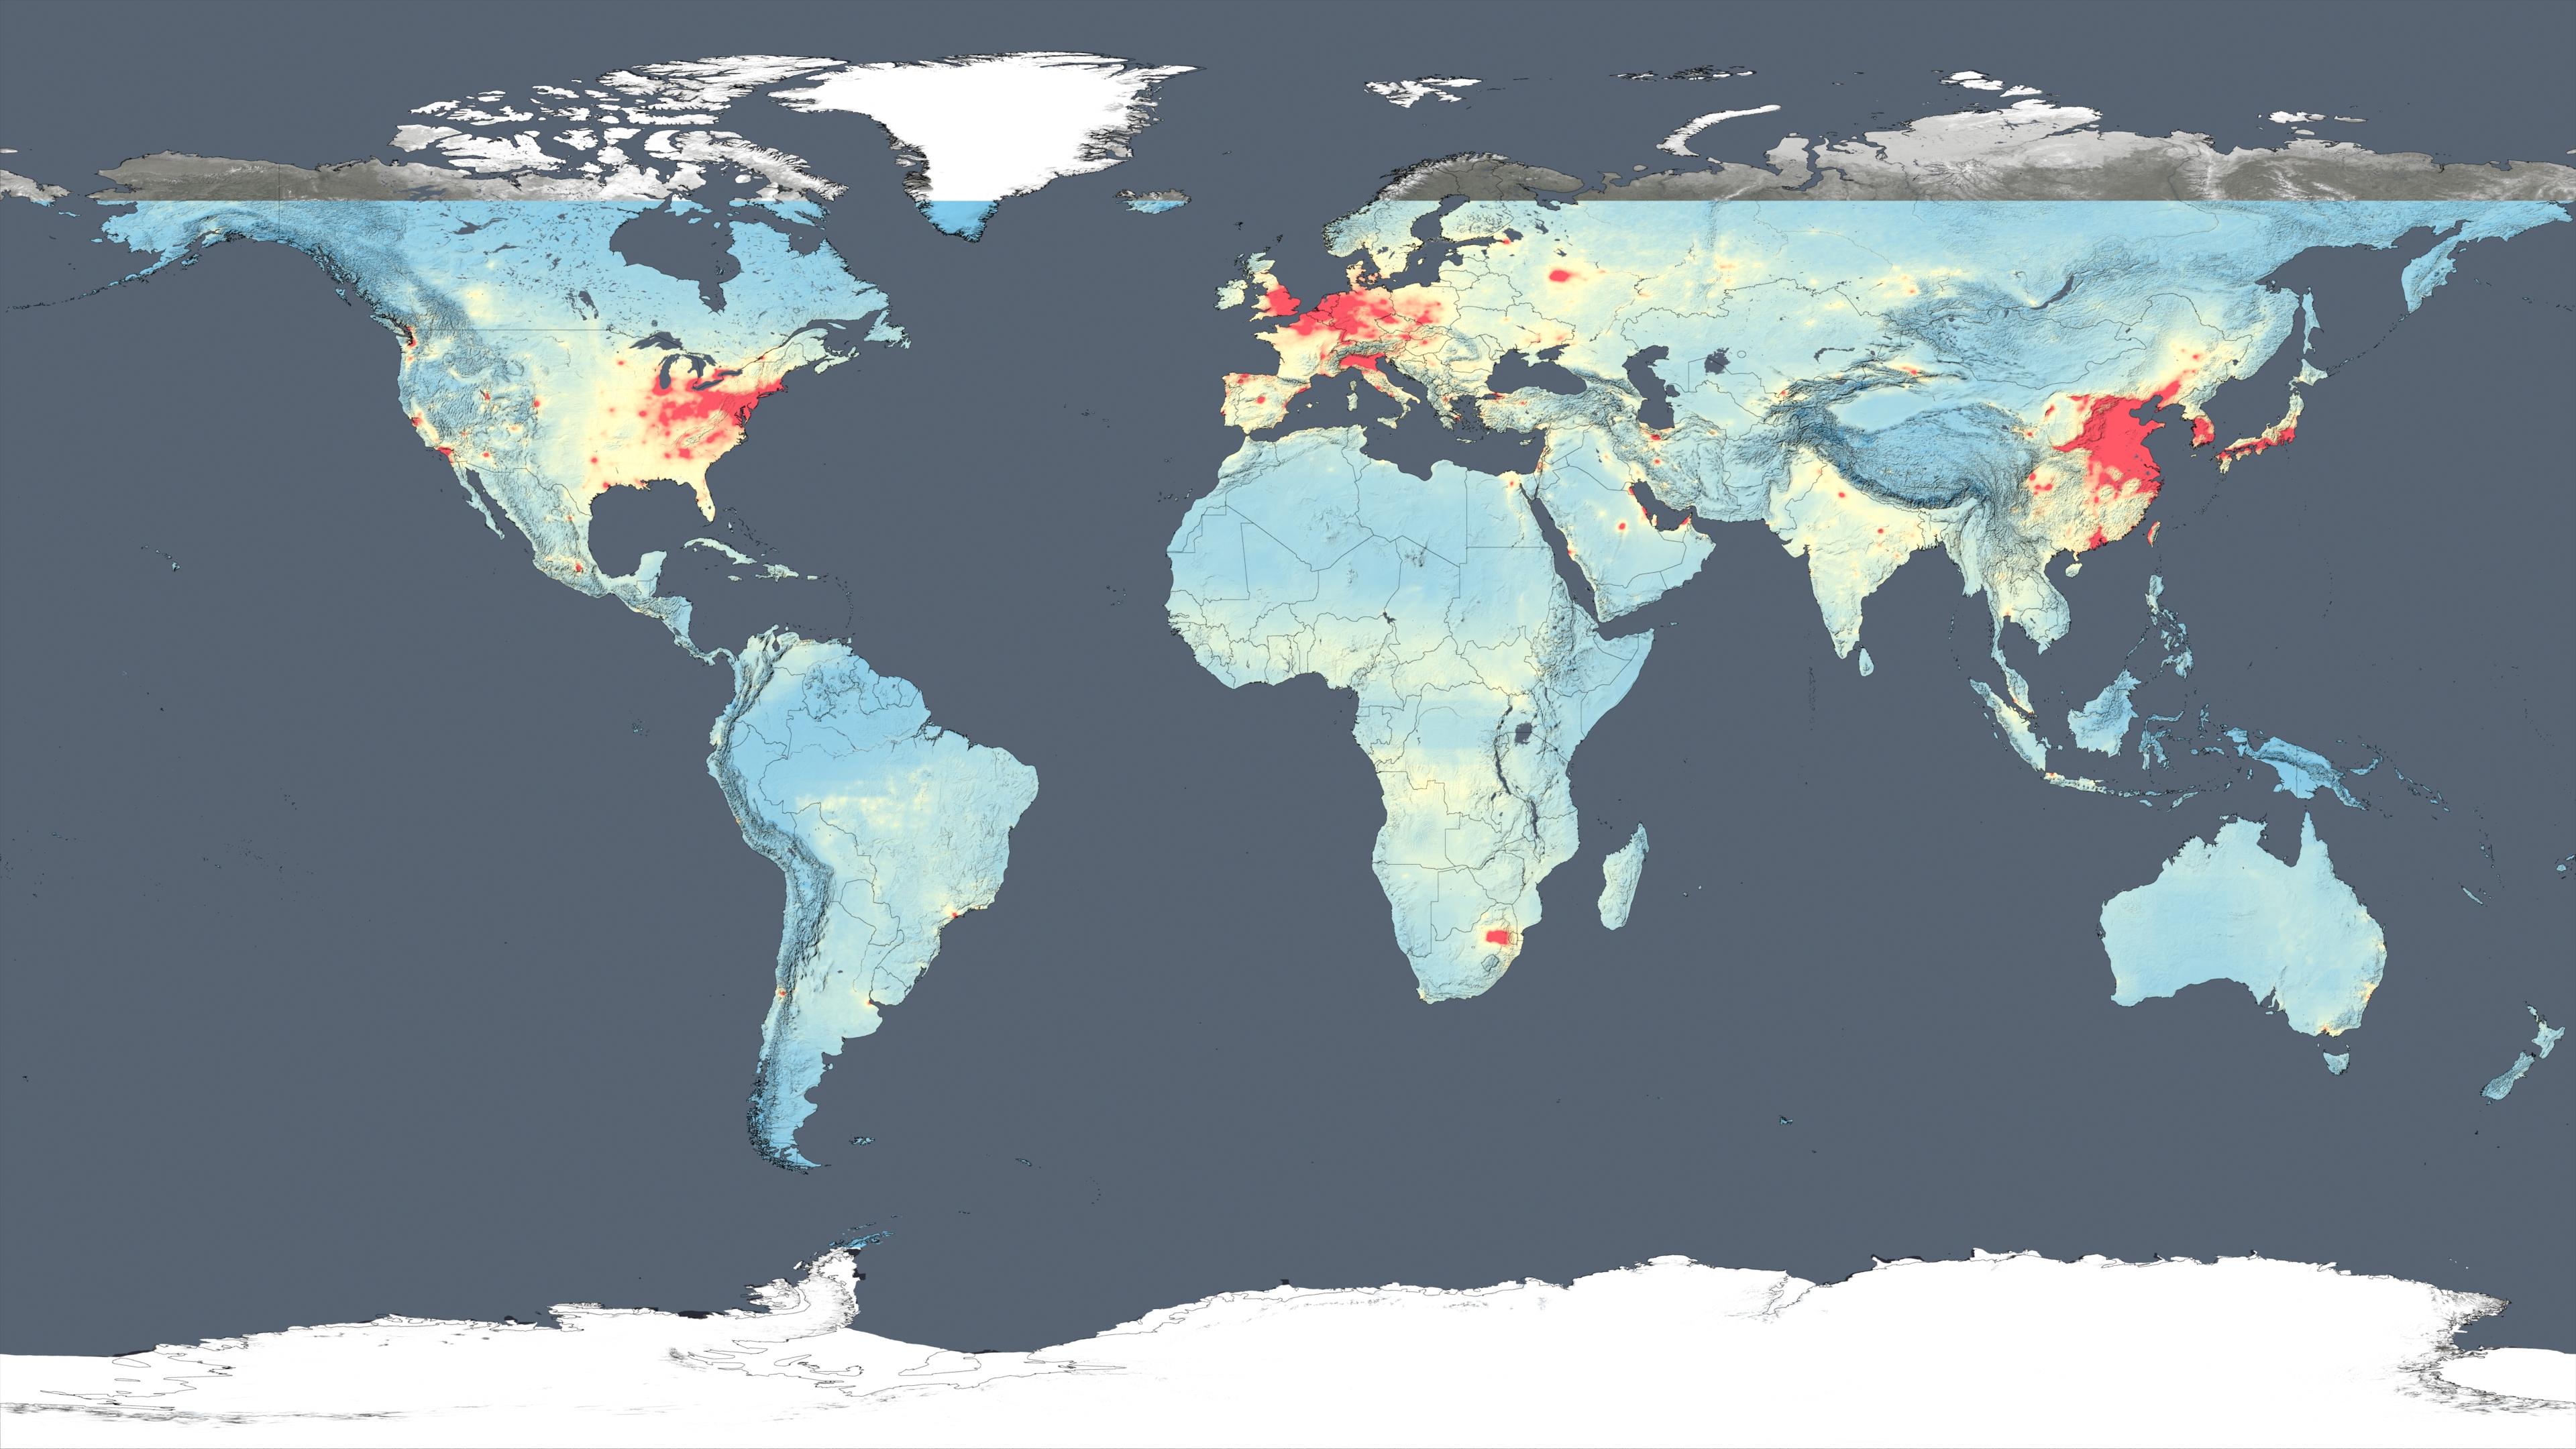 GMS: NASA Images Show Human Fingerprint on Global Air ...